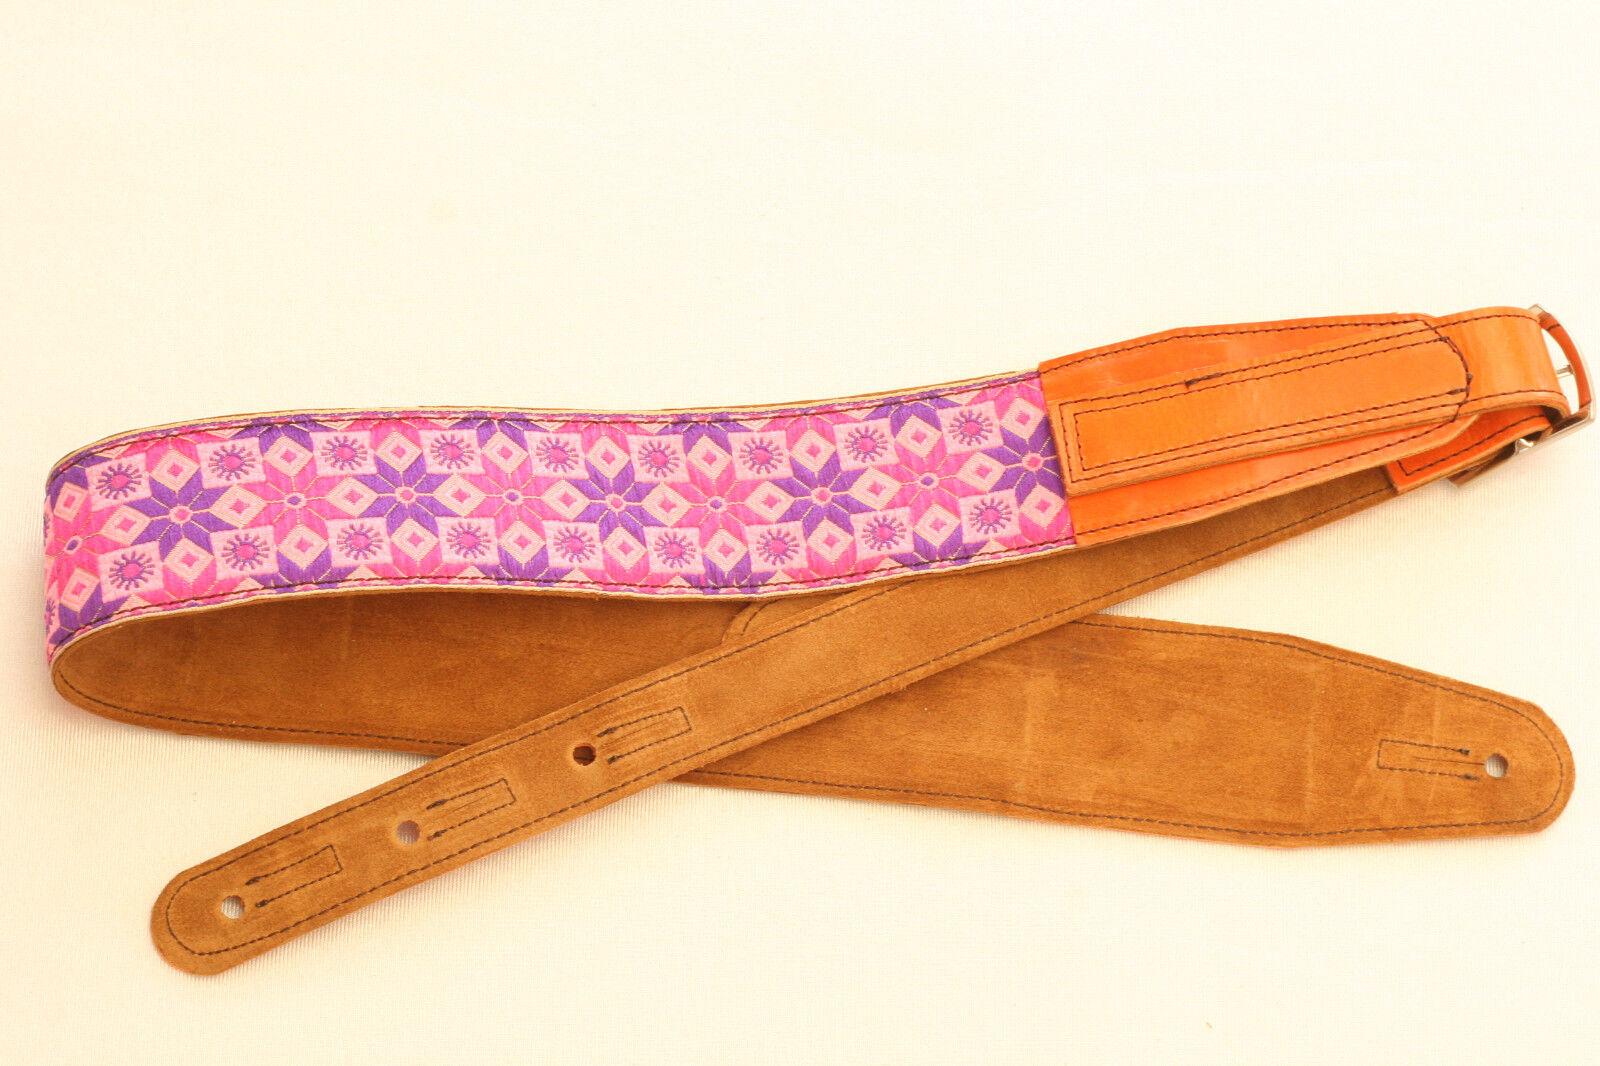 Cinturón guitarras pardo Guitar Strap púrpura Star Star Star cuero hippie Leather b060de  marca famosa